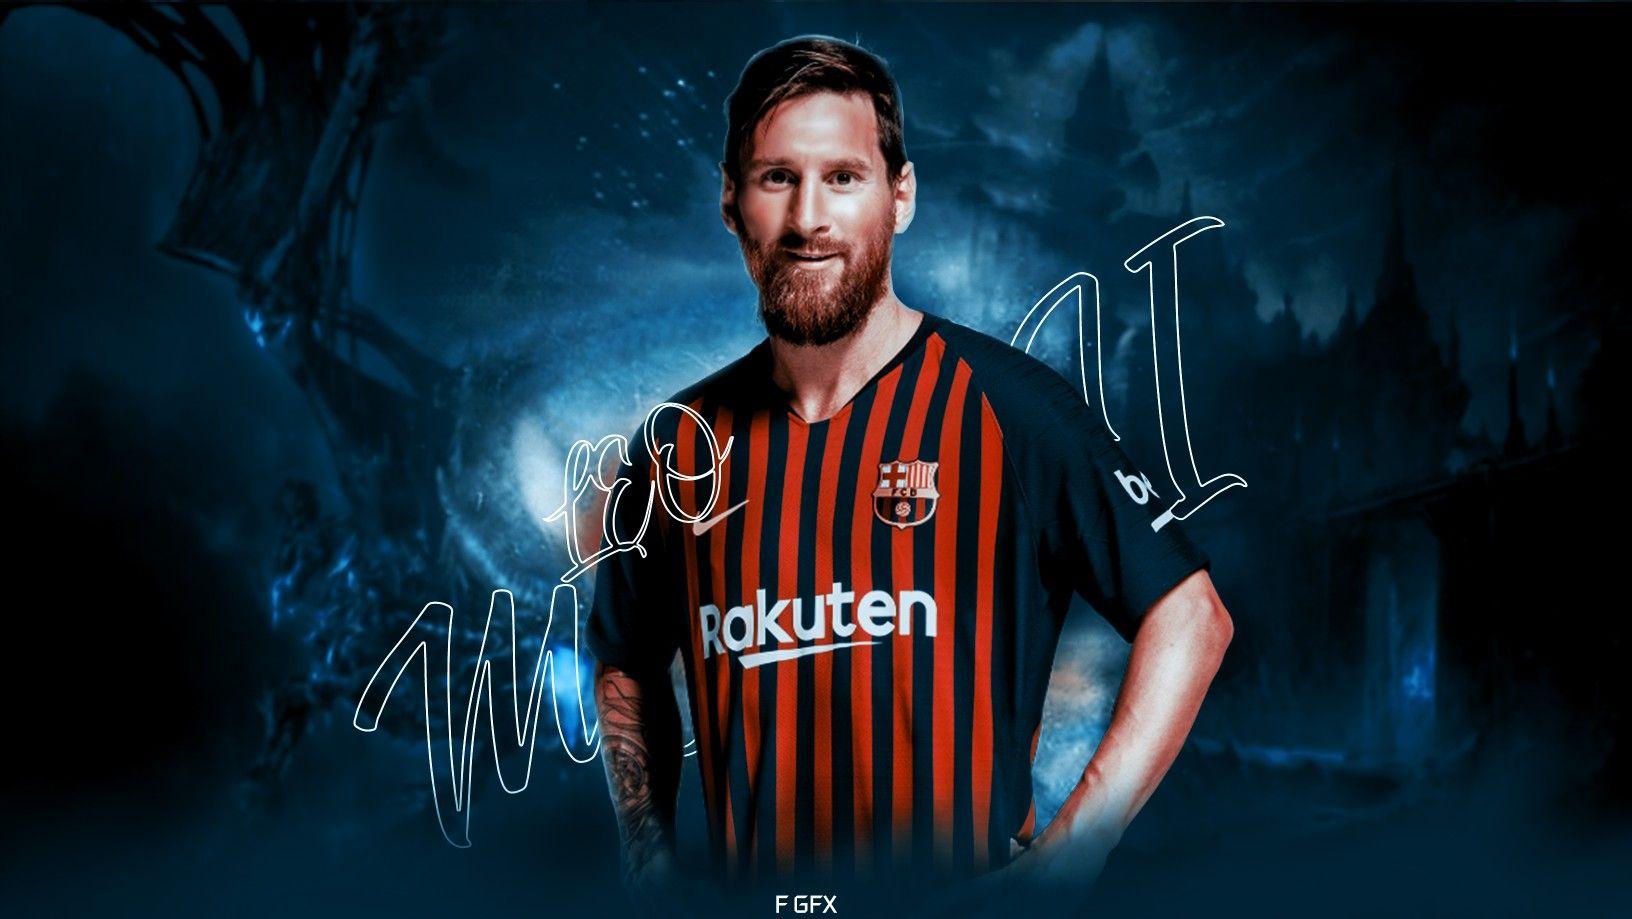 Messi Wallpaper Pc